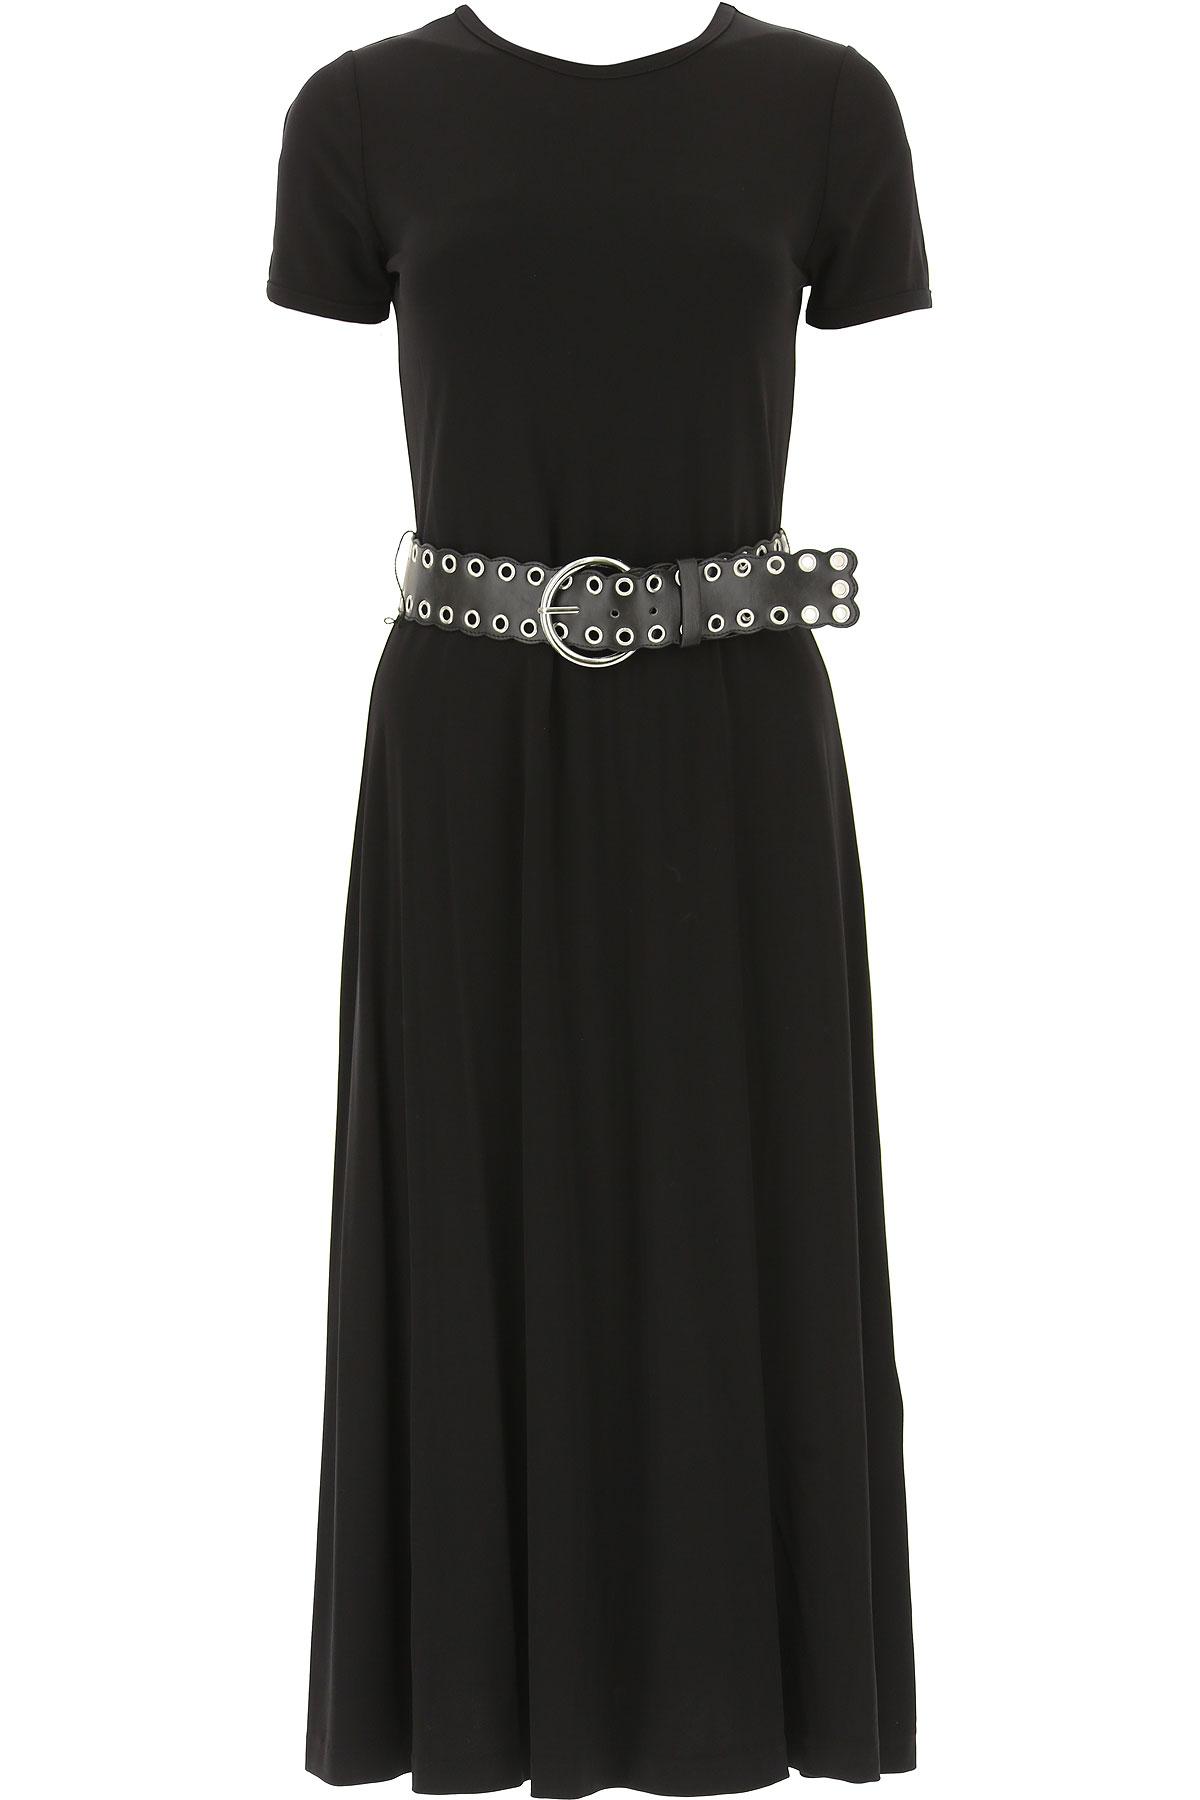 Michael Kors Dress for Women, Evening Cocktail Party, Black, Viscose, 2019, 10 12 6 8